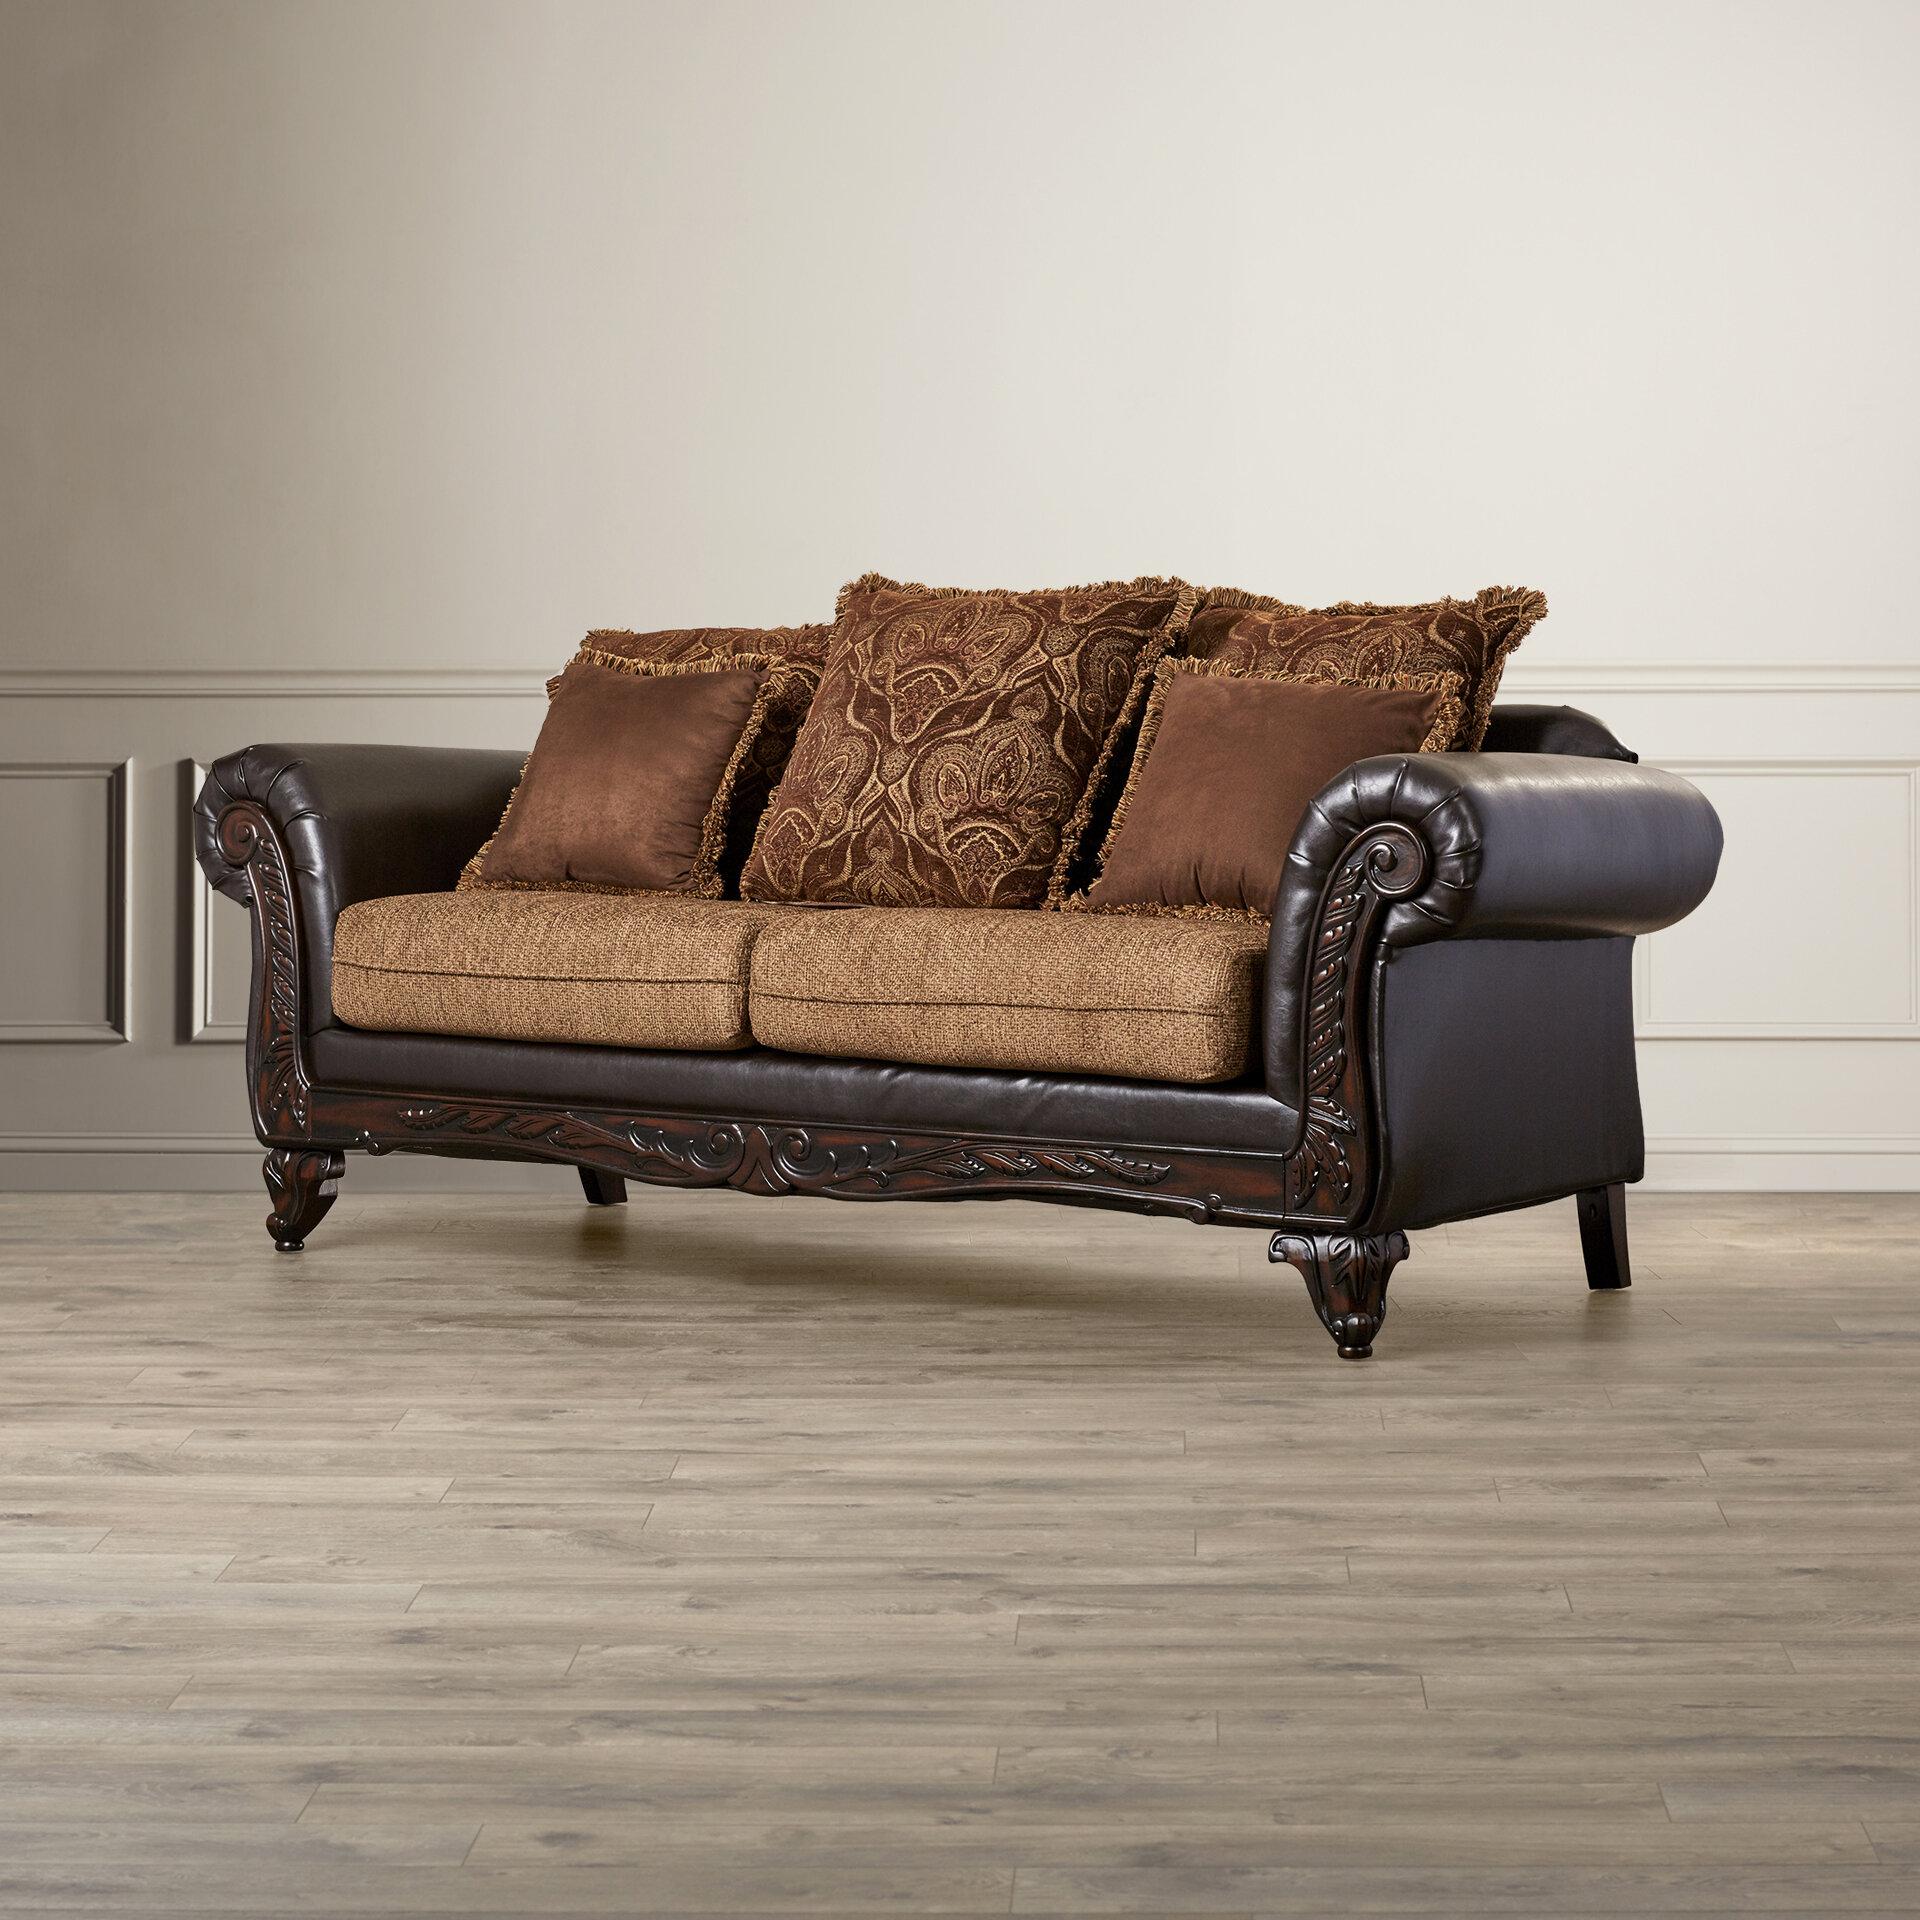 sofa sofas p mink couch espresso polyester rta serta brown loveseats paolo san